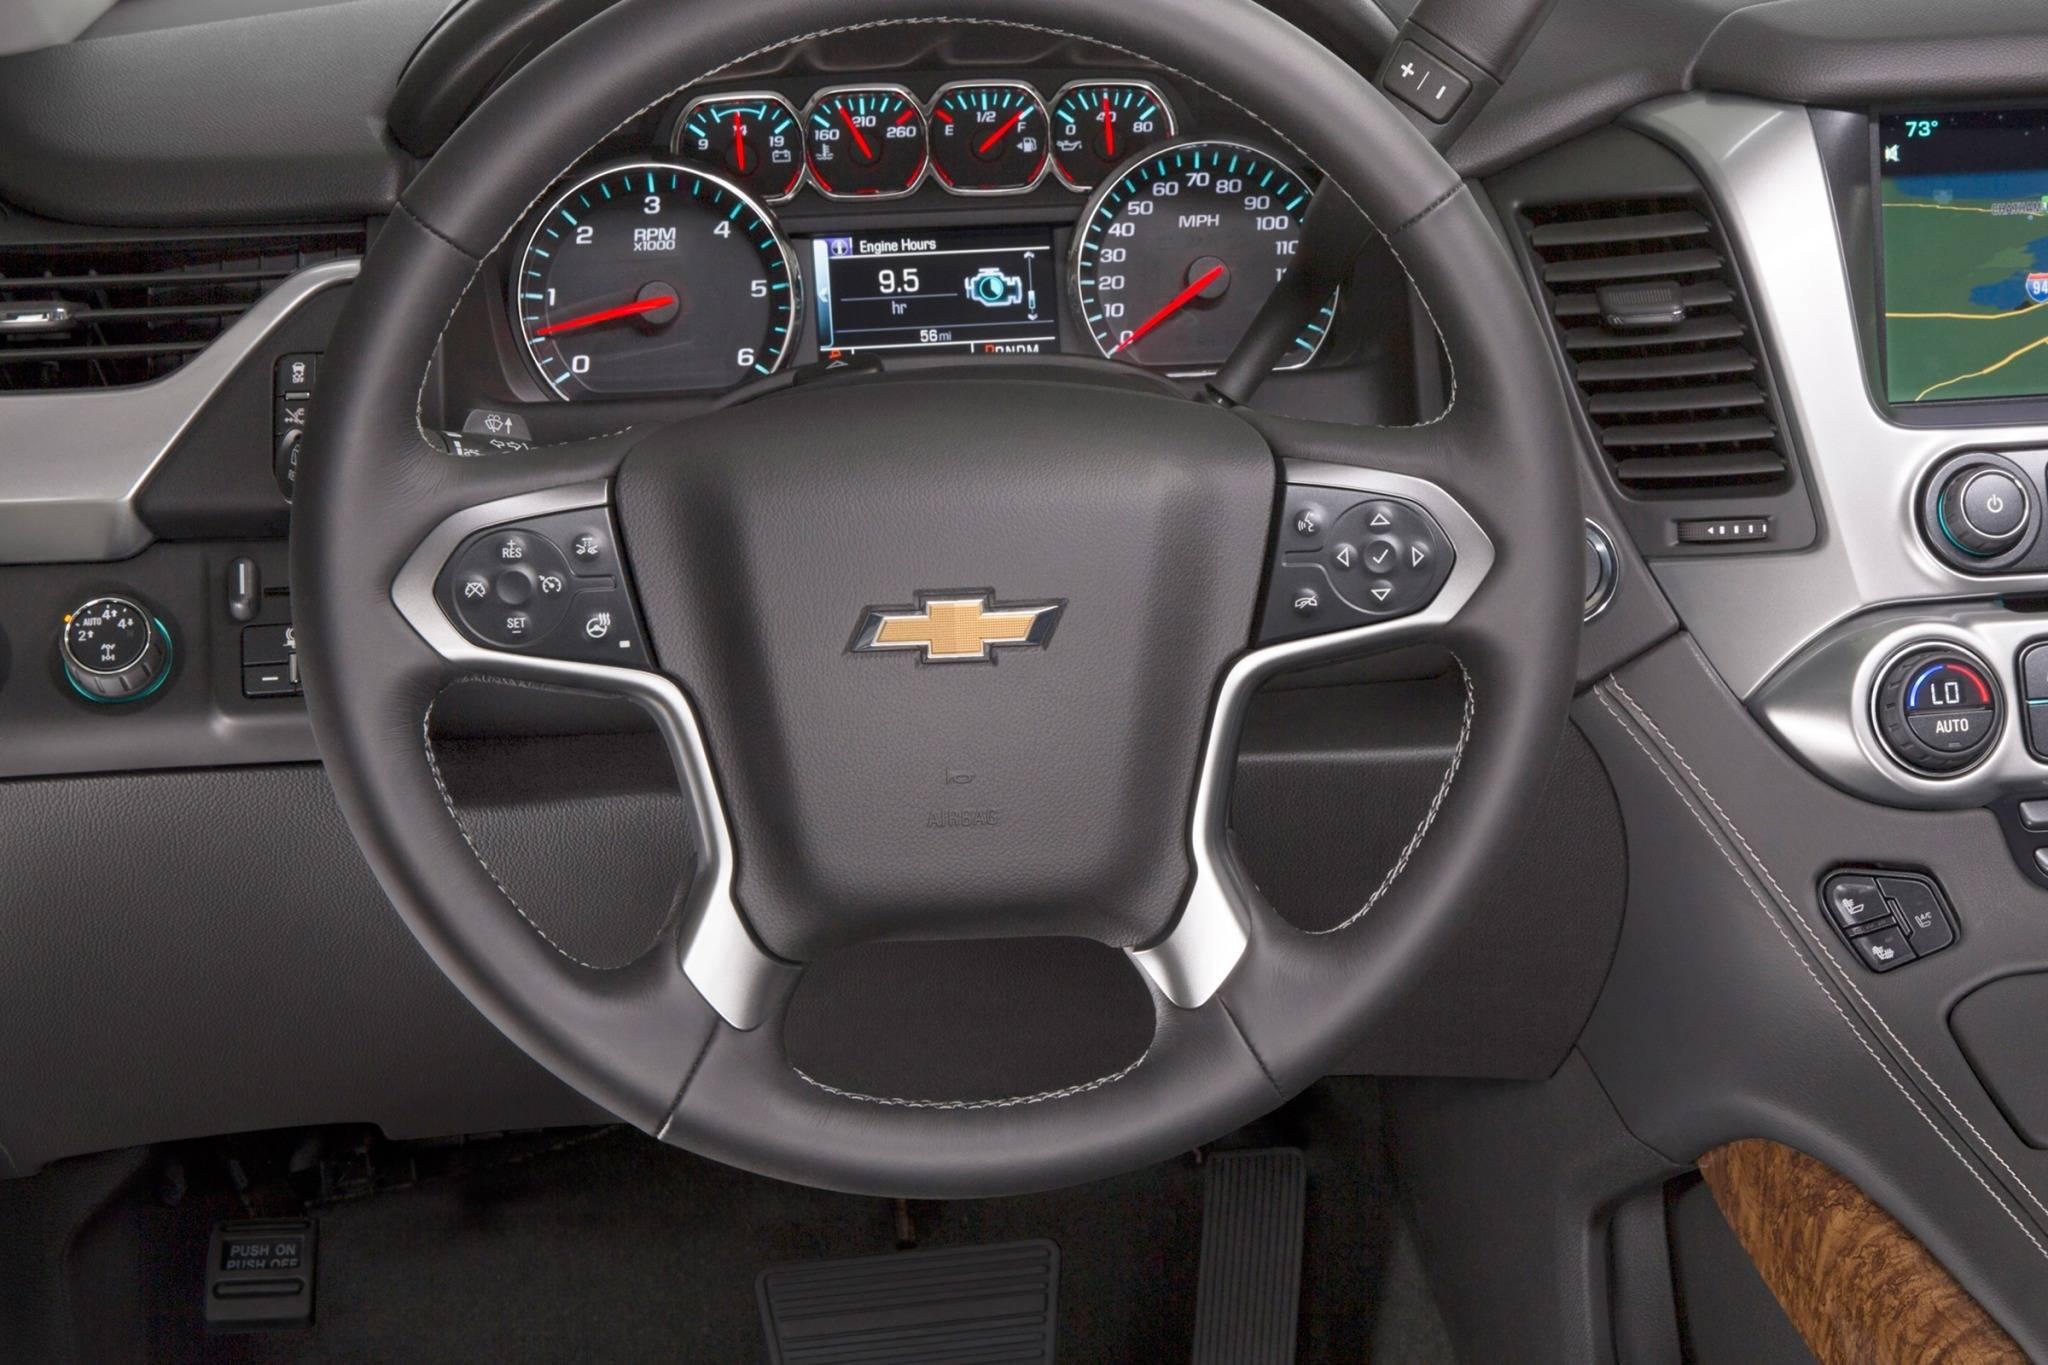 2017 Chevrolet Tahoe VIN Check, Specs & Recalls ...